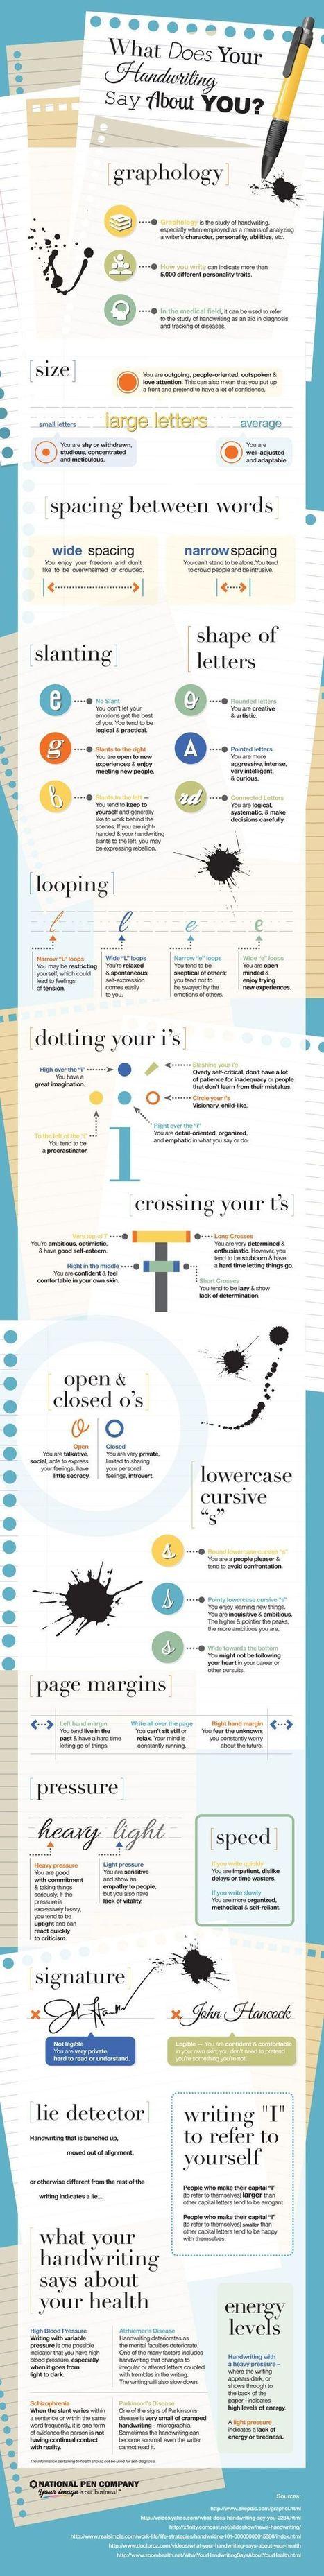 Interesting Stuff | Interesting Stuff from around the web | Scoop.it